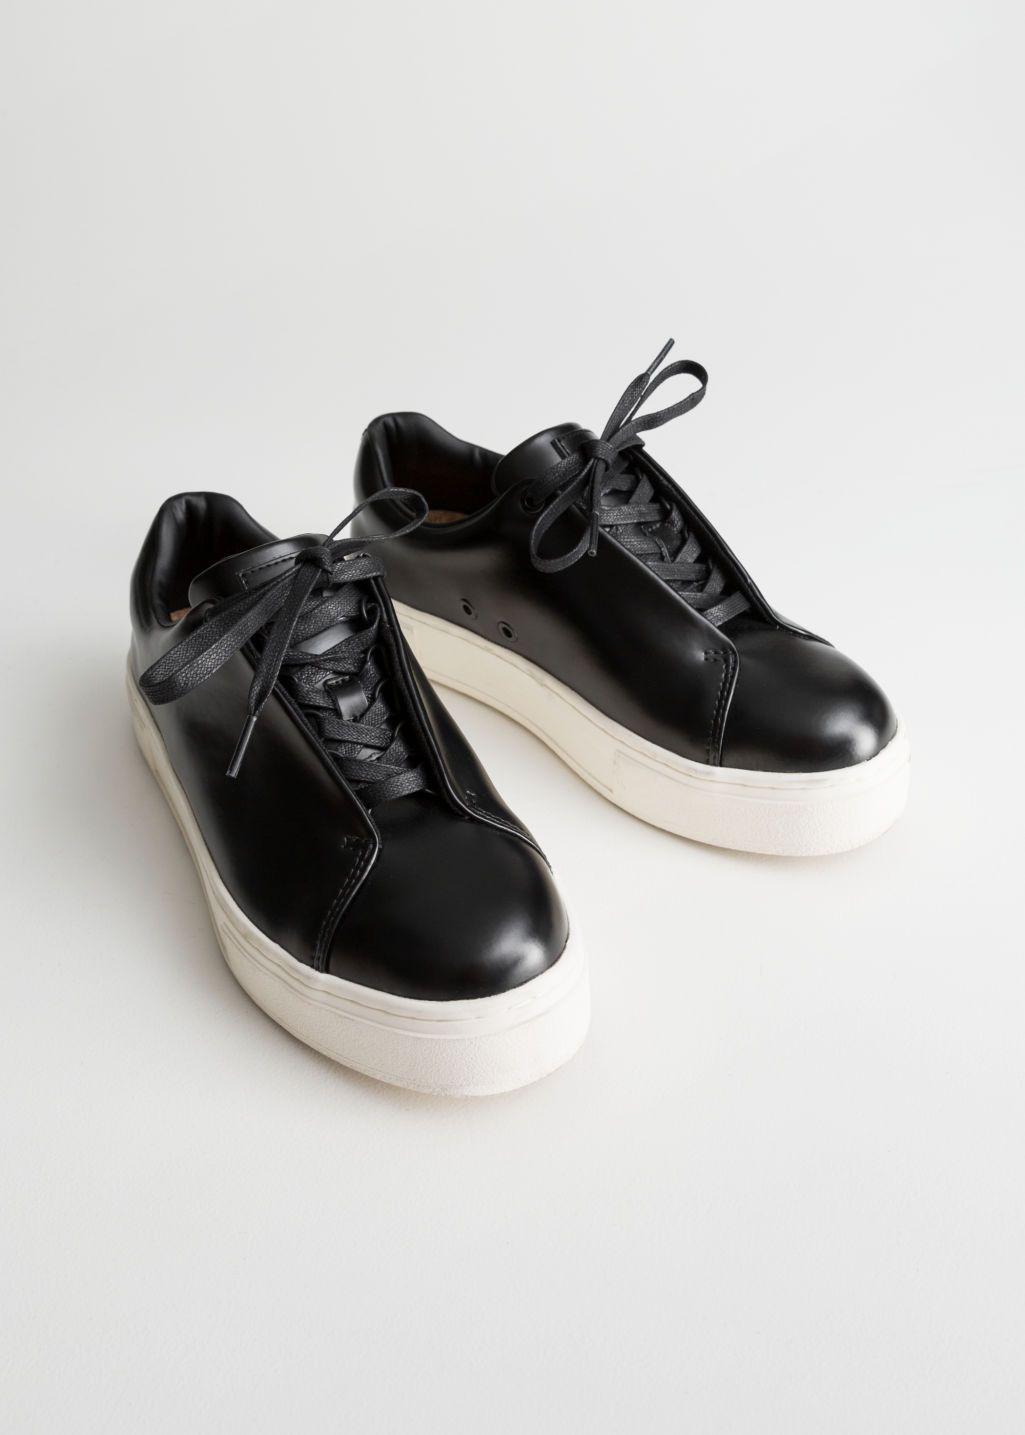 3f0b55e50de Eytys Doja in 2019 | Skor | Sneakers, Footwear, Wedges